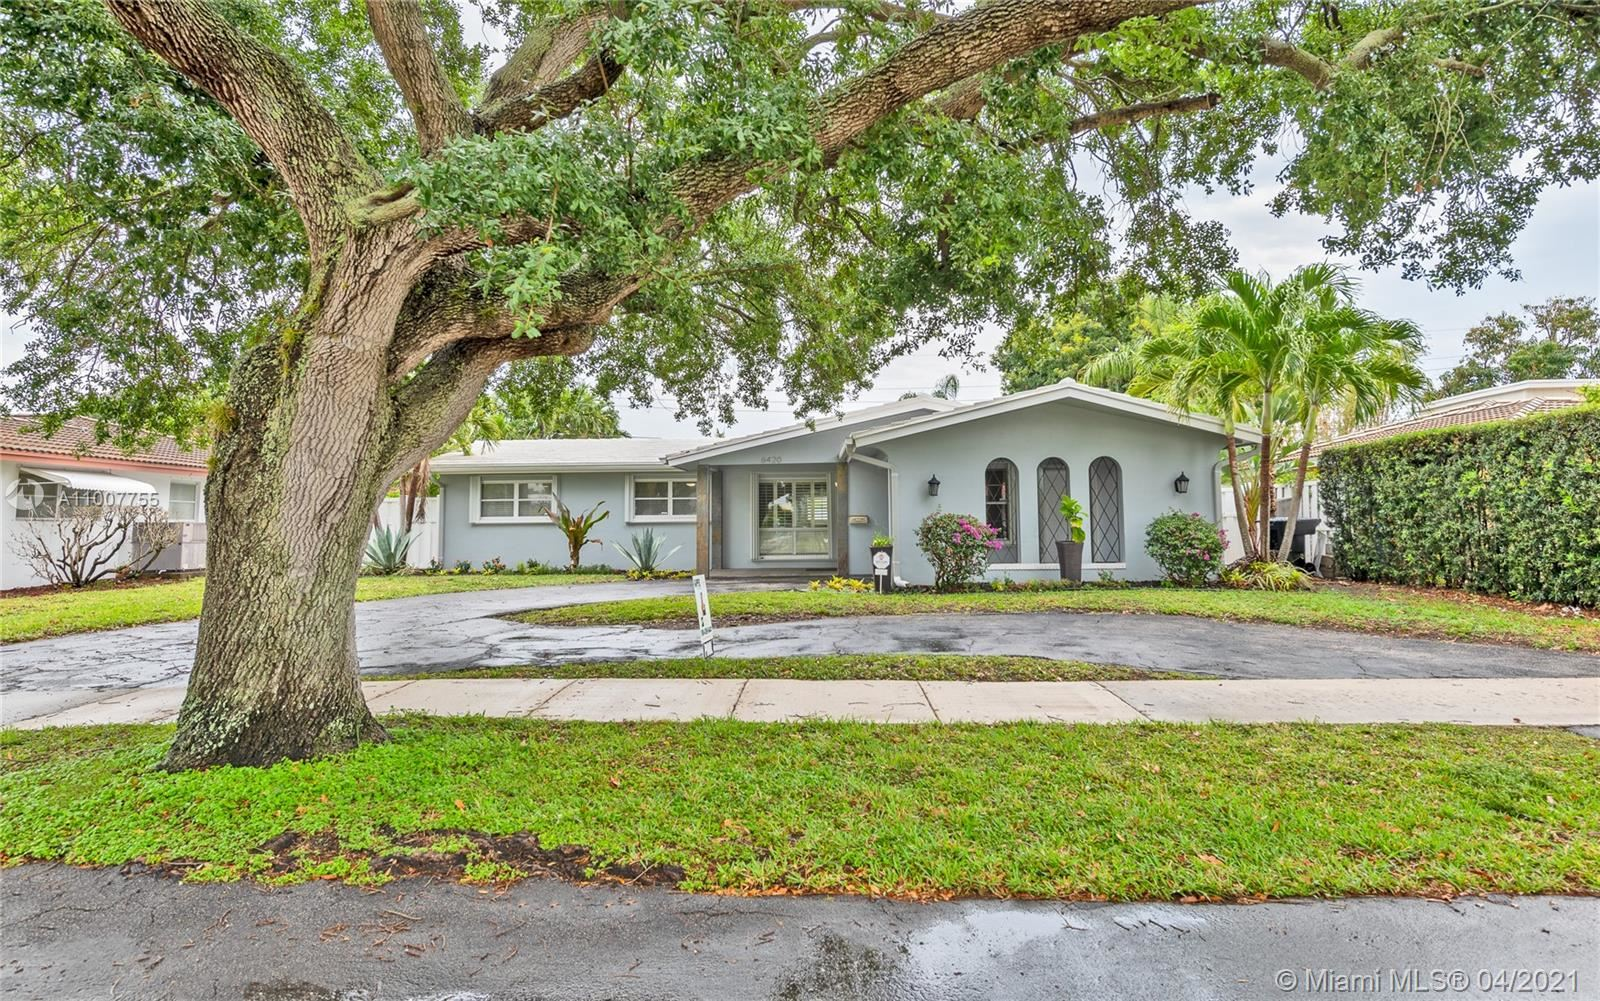 6420 NE 21st Dr, Fort Lauderdale, FL 33308 - #: A11007755